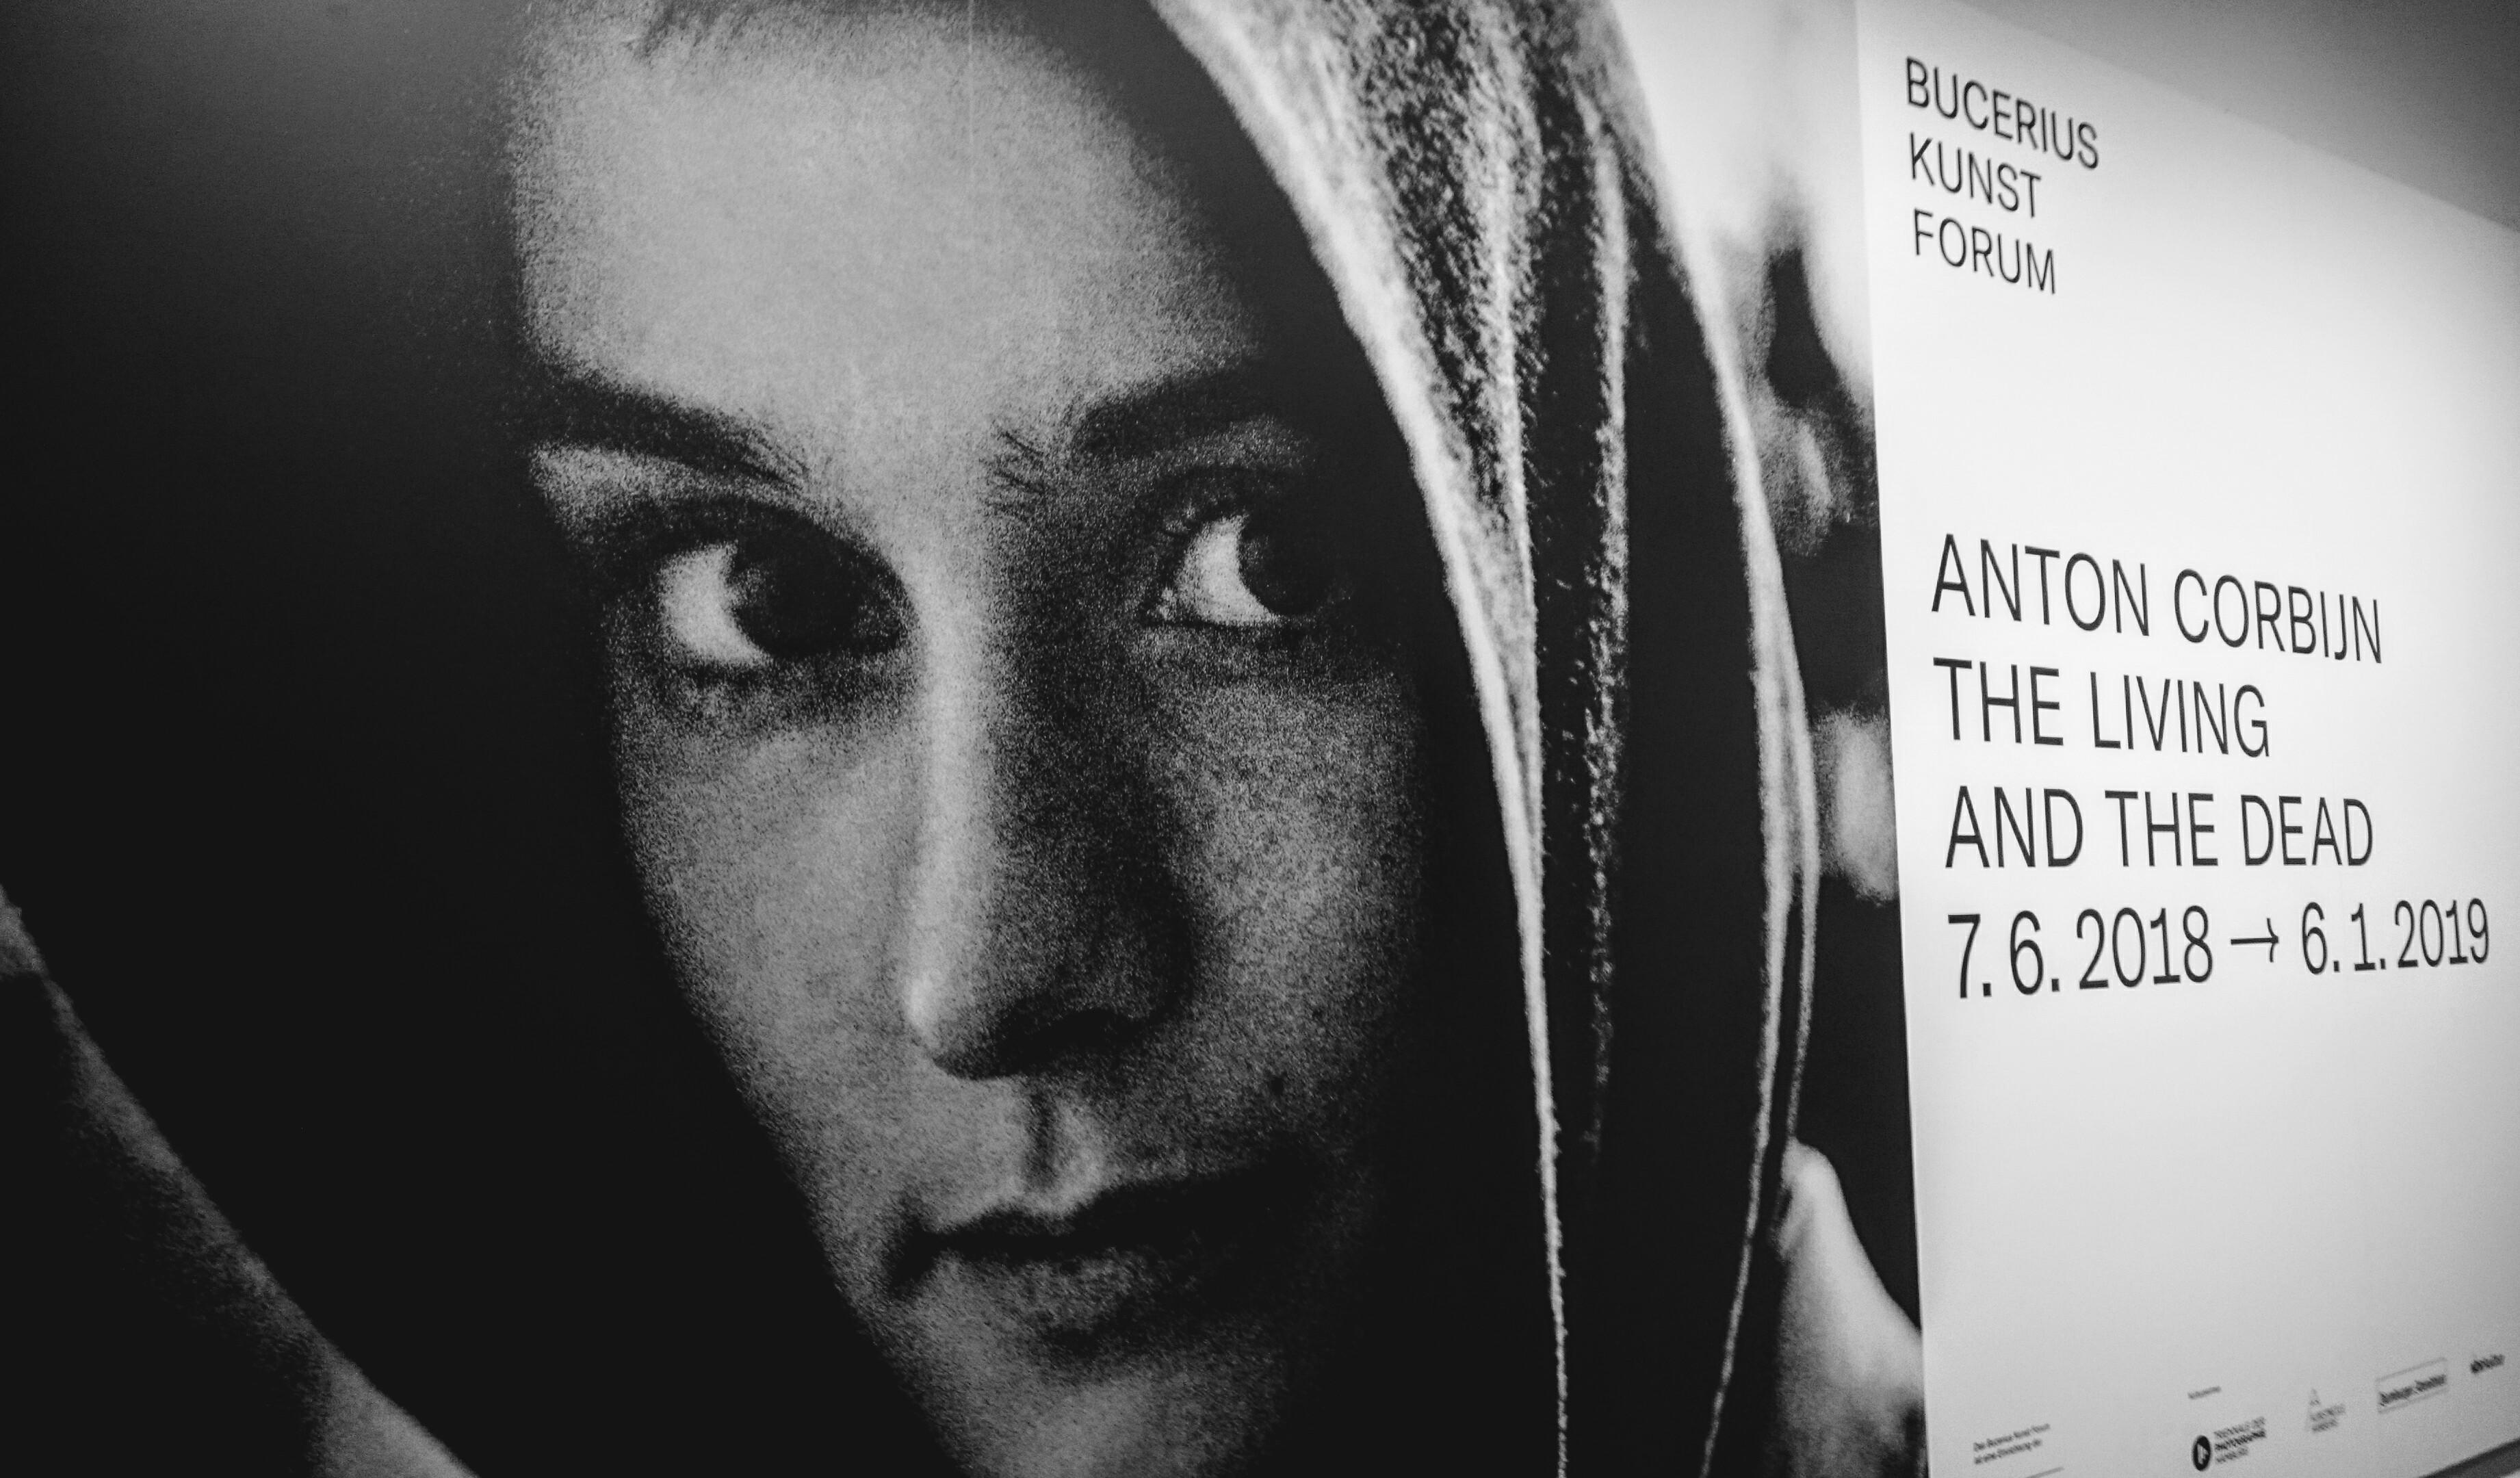 Exhibition, Photographie, Anton Corbijn, Bucerius Kunst Forum, Hamburg, Popmusic, Talk, Daniel Miller, Mute Records, Max Dax, Musicjournalist, Sinead O Connor